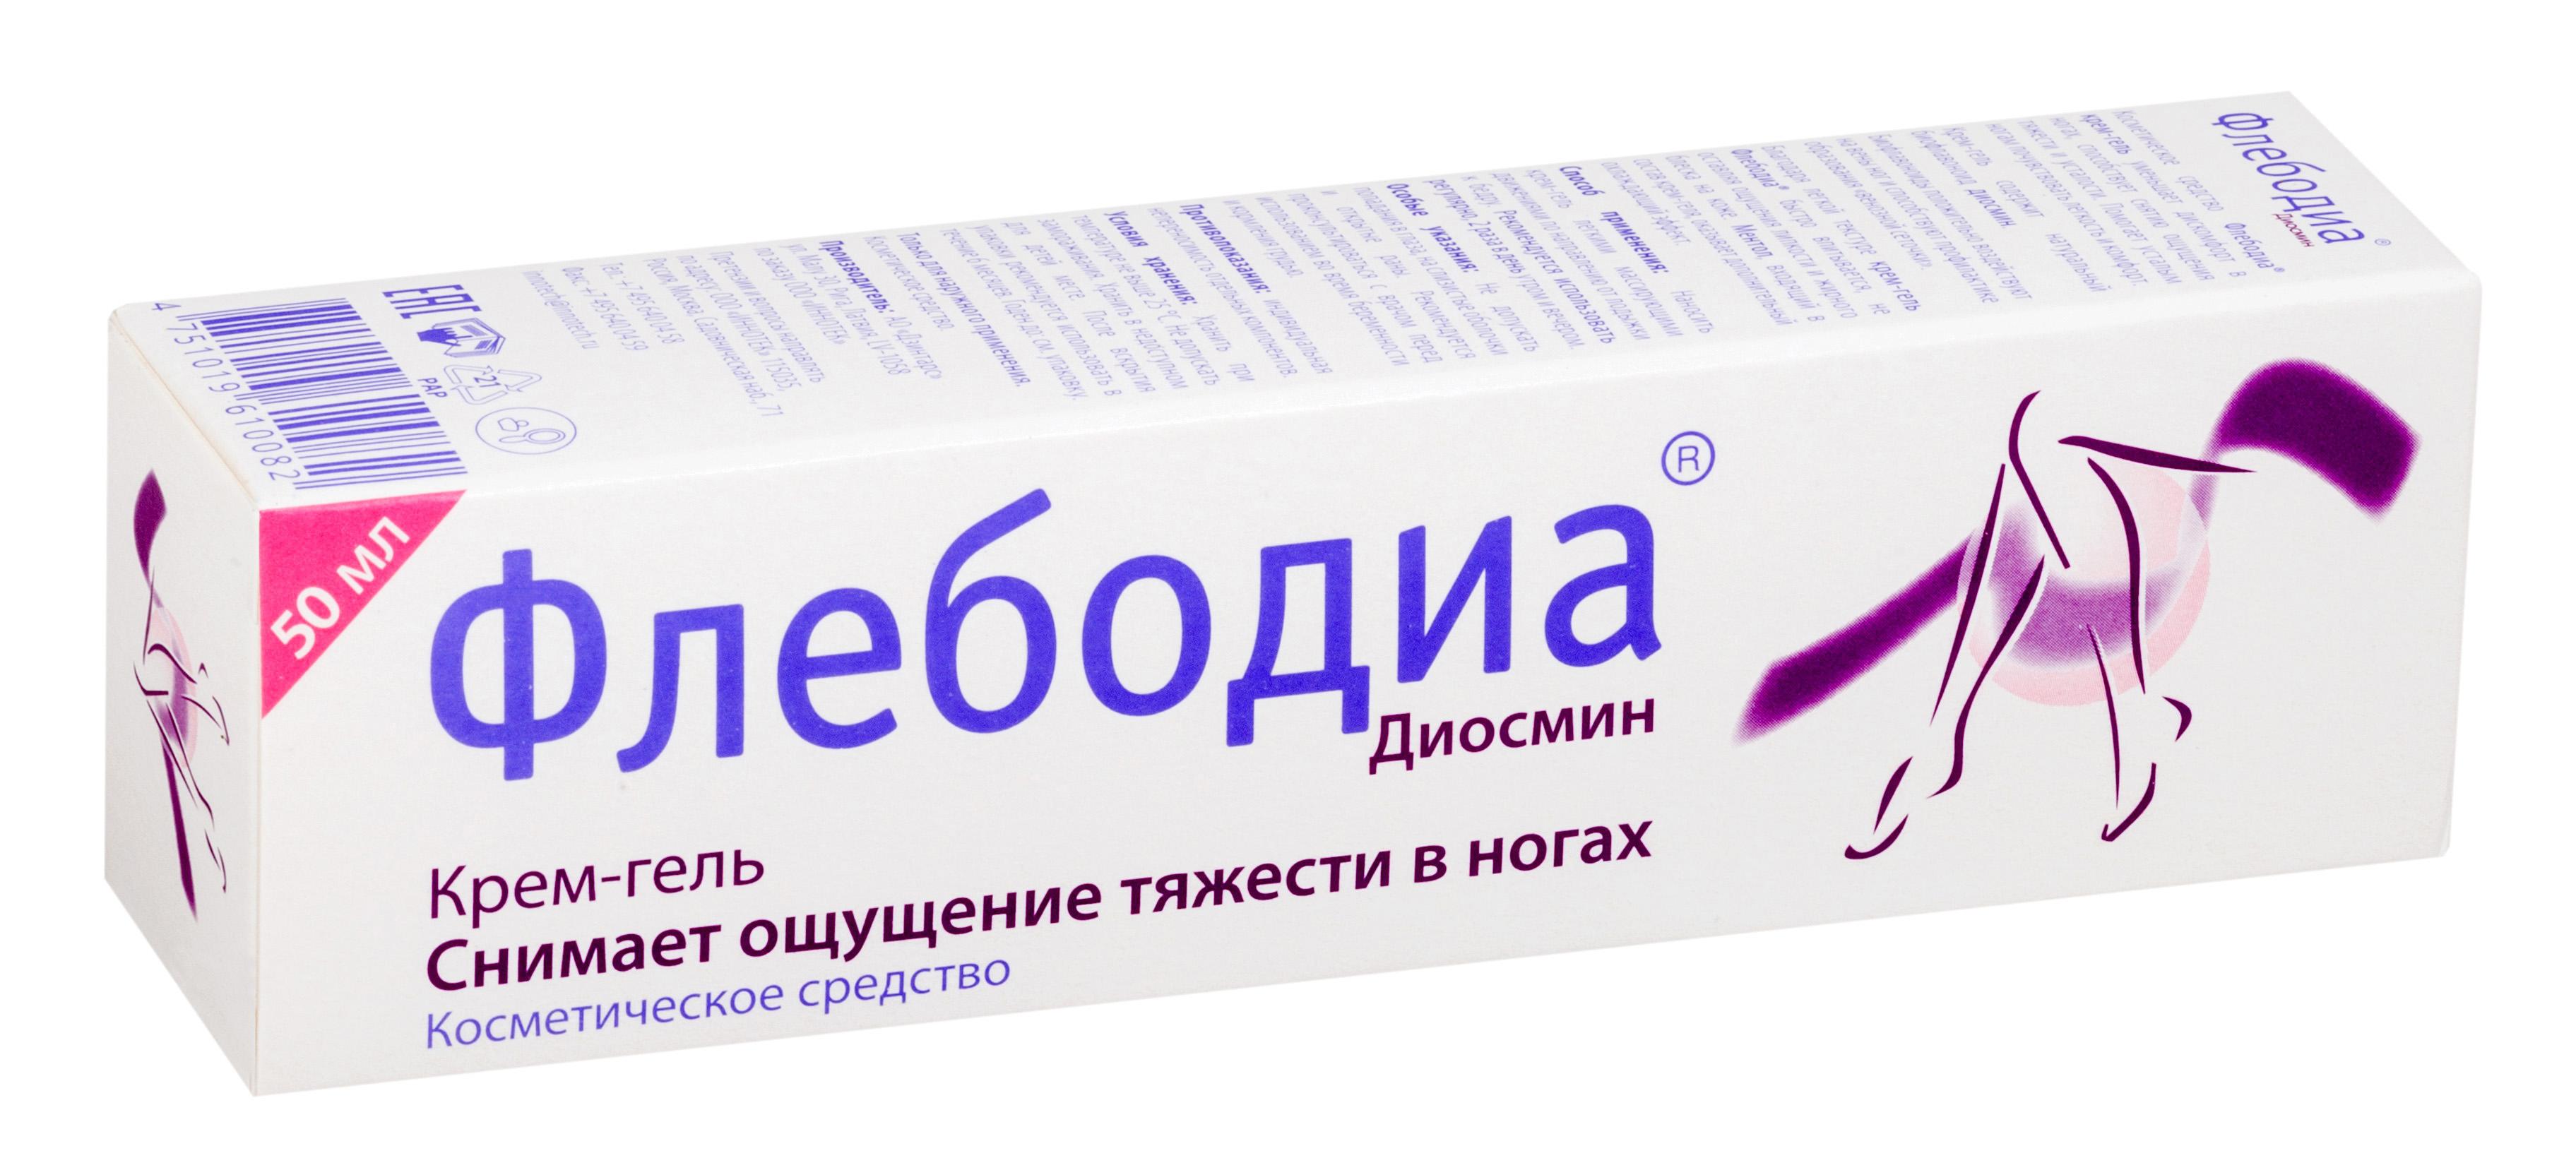 Флебодиа крем-гель д/ног туба 50мл